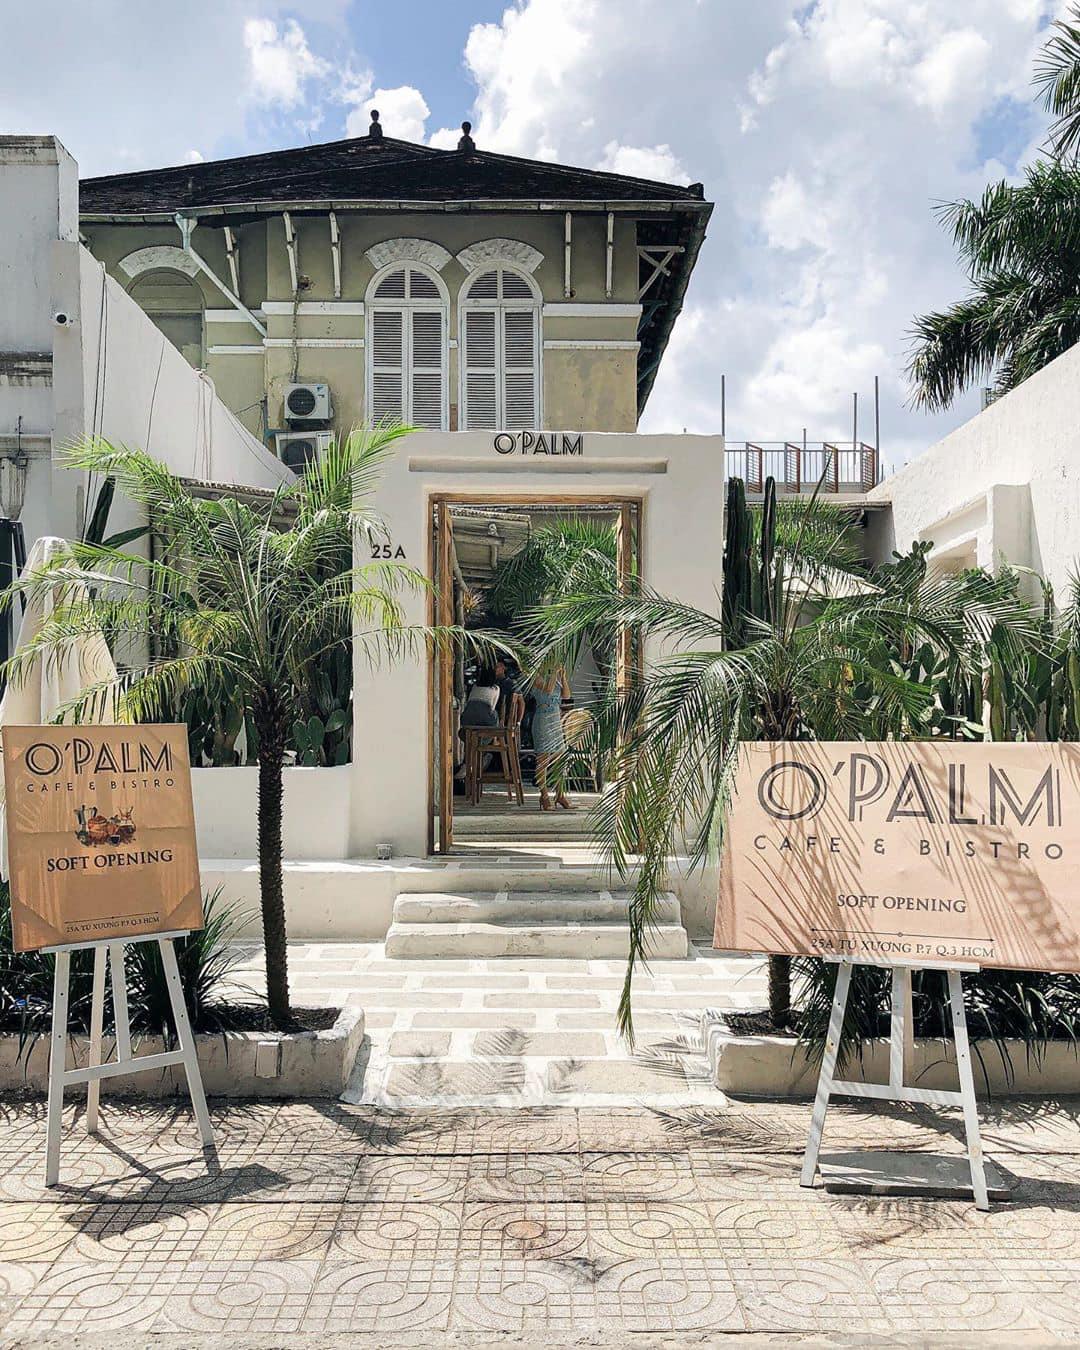 Mẫu thiết kế O'Palm Cafe & Bistro